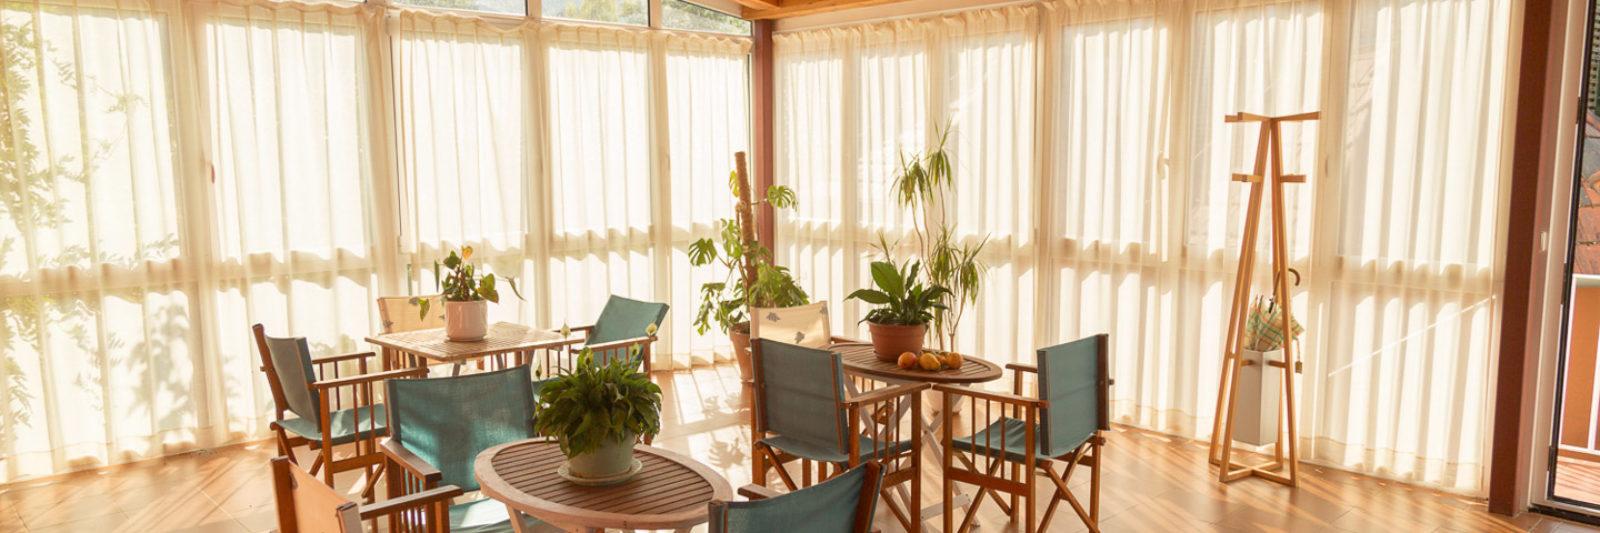 Amalurra Dormitories Hostel Accommodation